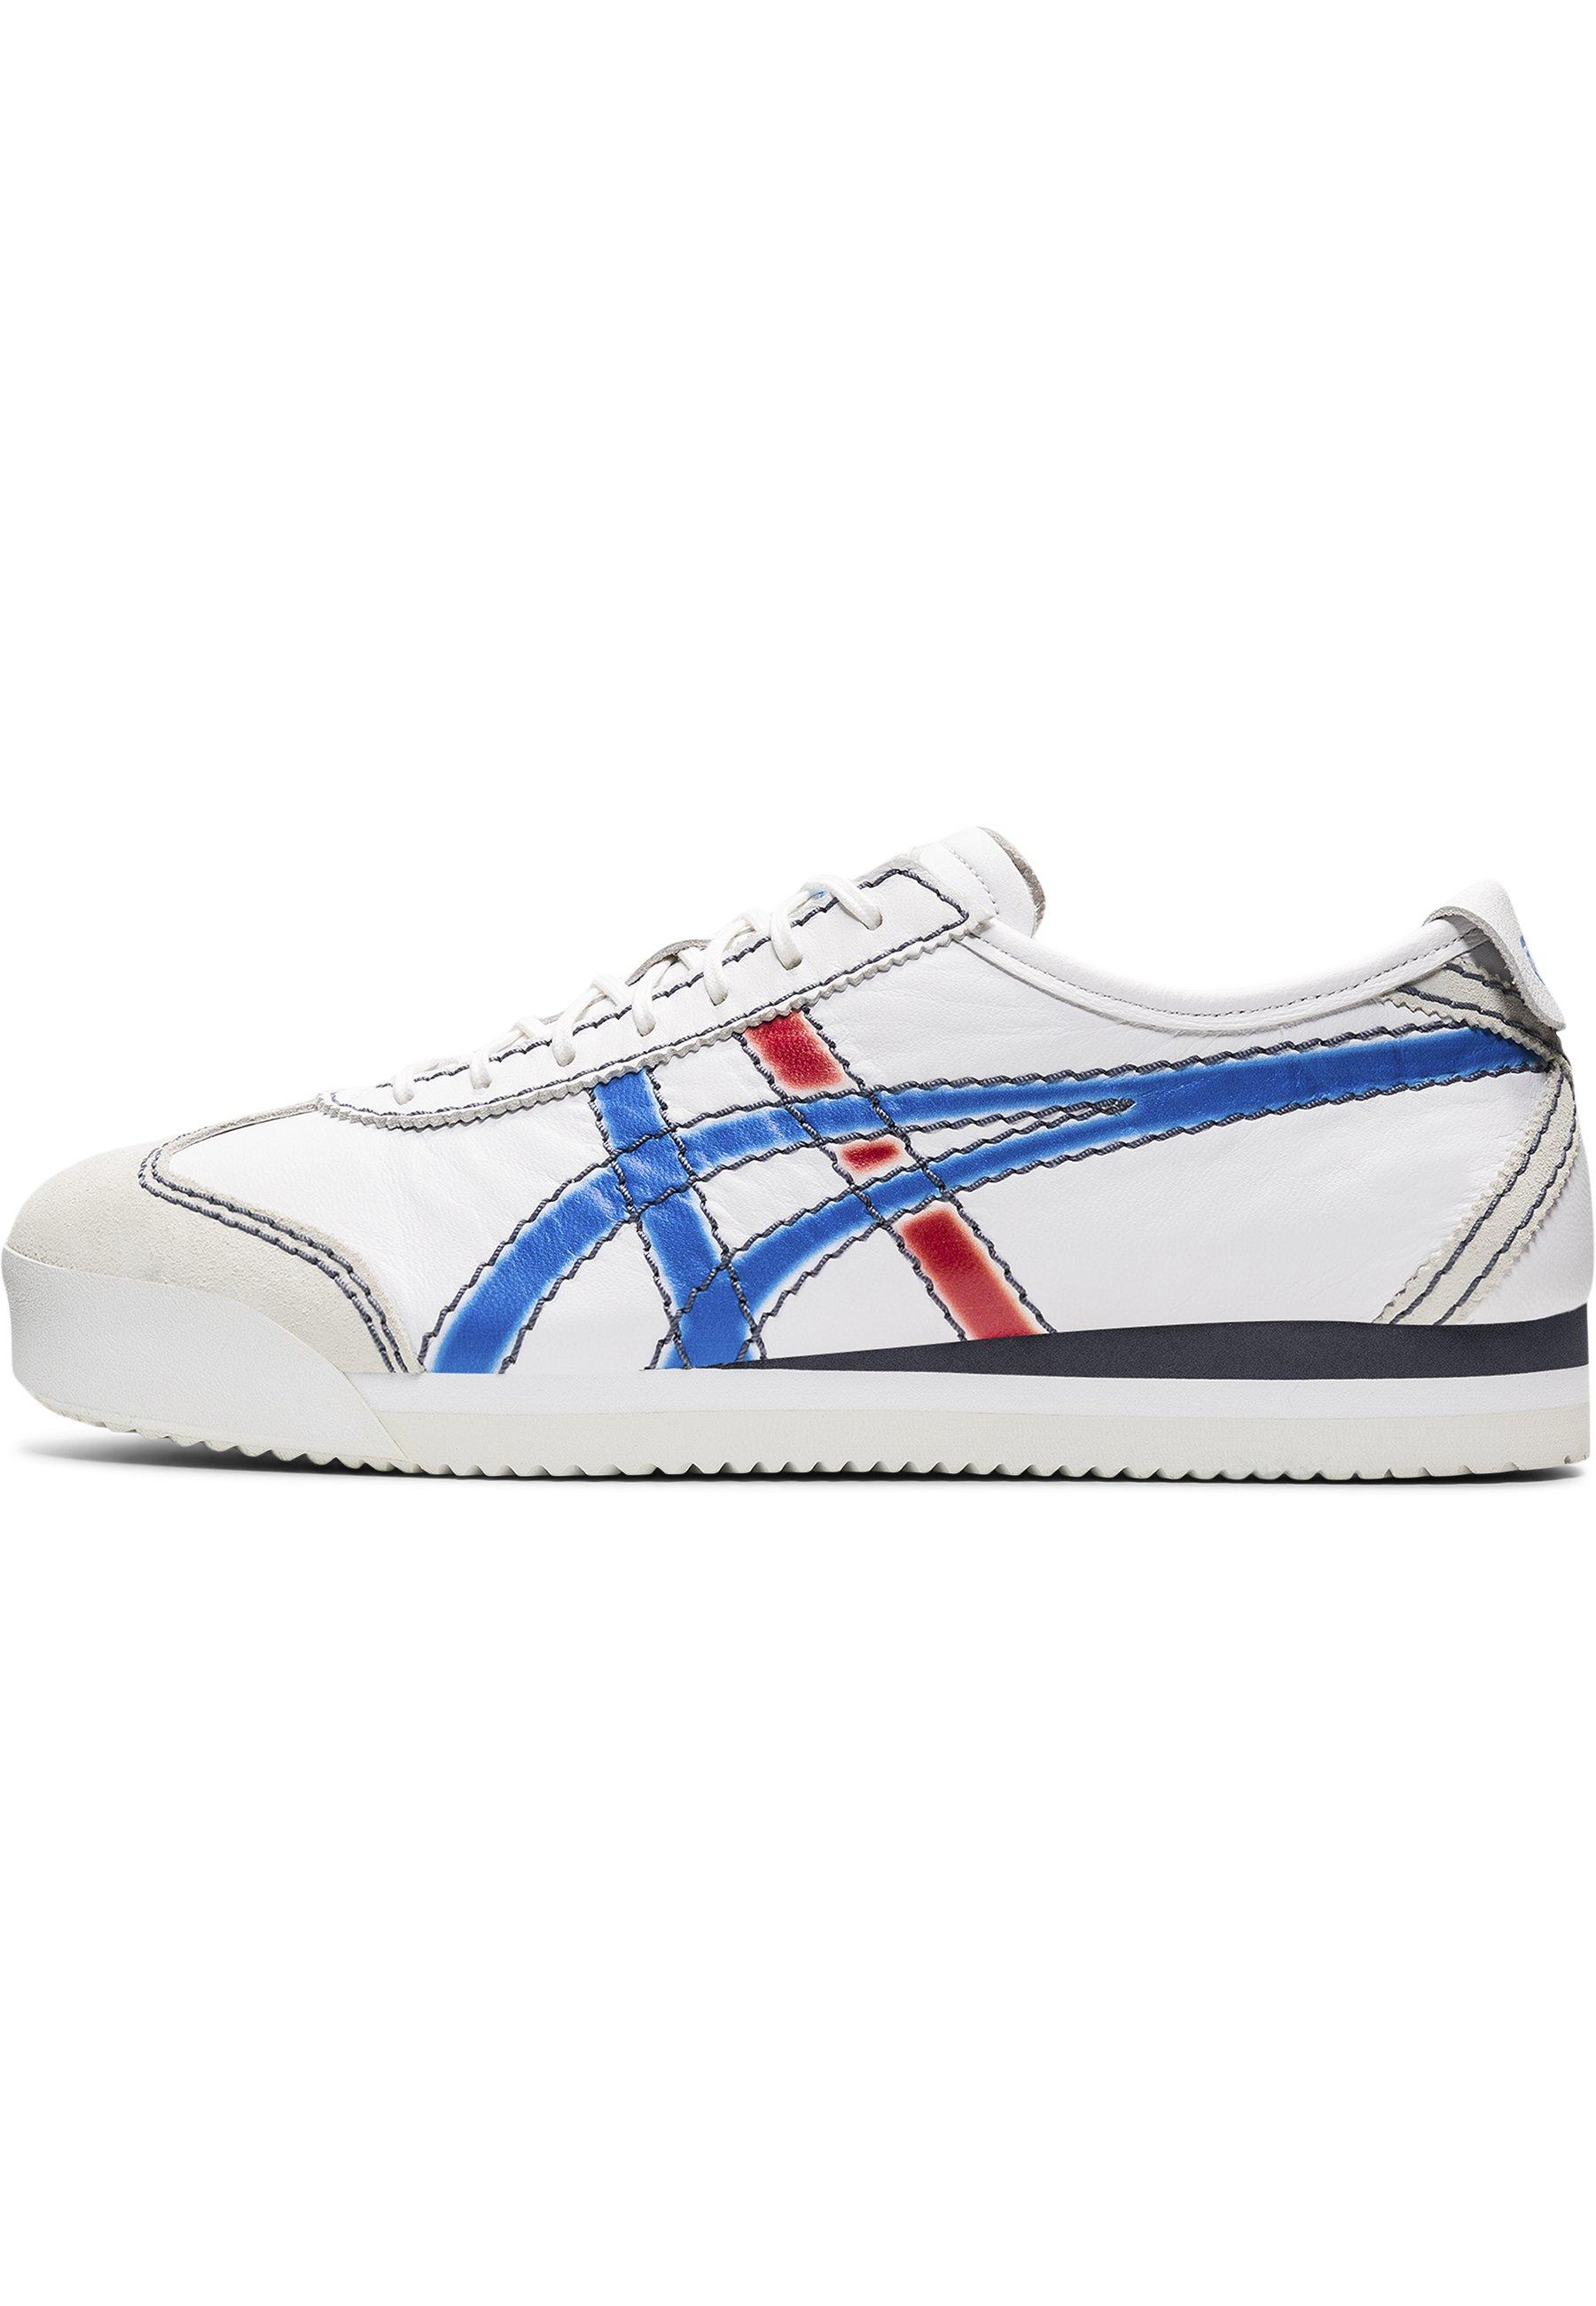 Chaussures homme Onitsuka Tiger   Large choix en ligne sur Zalando